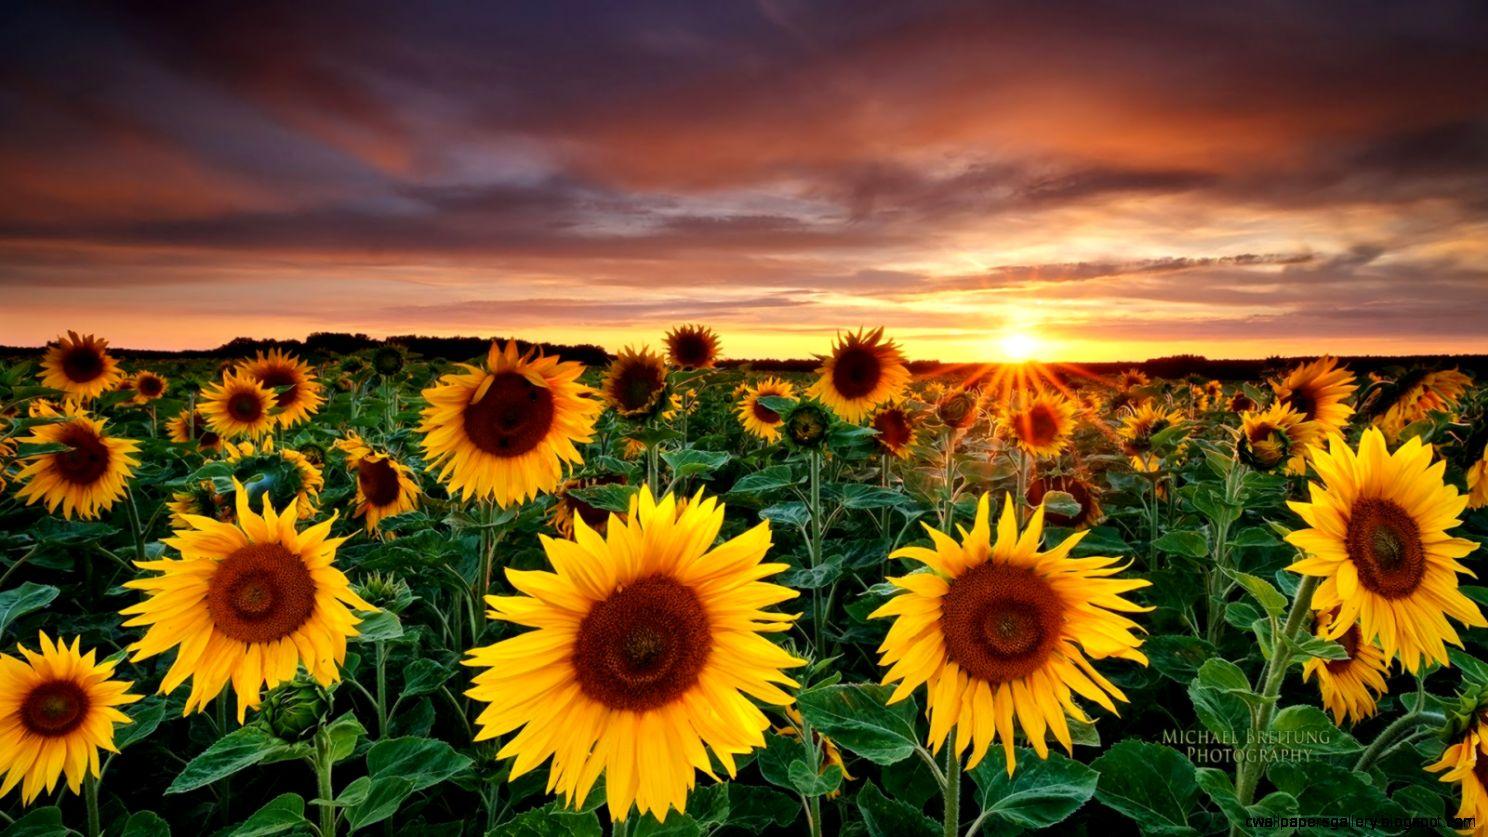 Sunflower Photography Tumblr   wallpaper